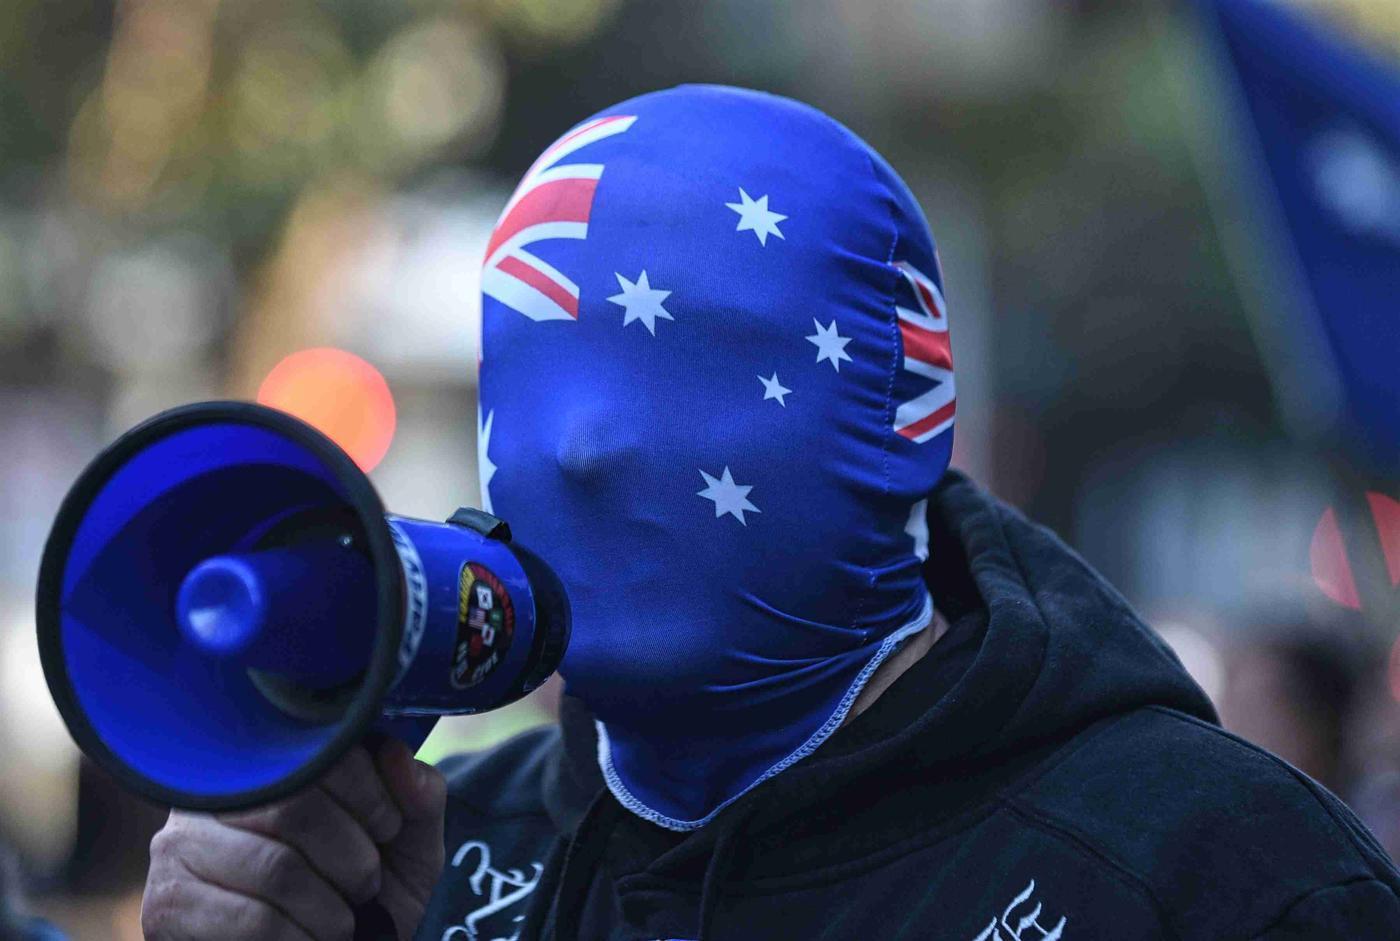 Australia, you have a problem with Islamophobia   Middle East Eye